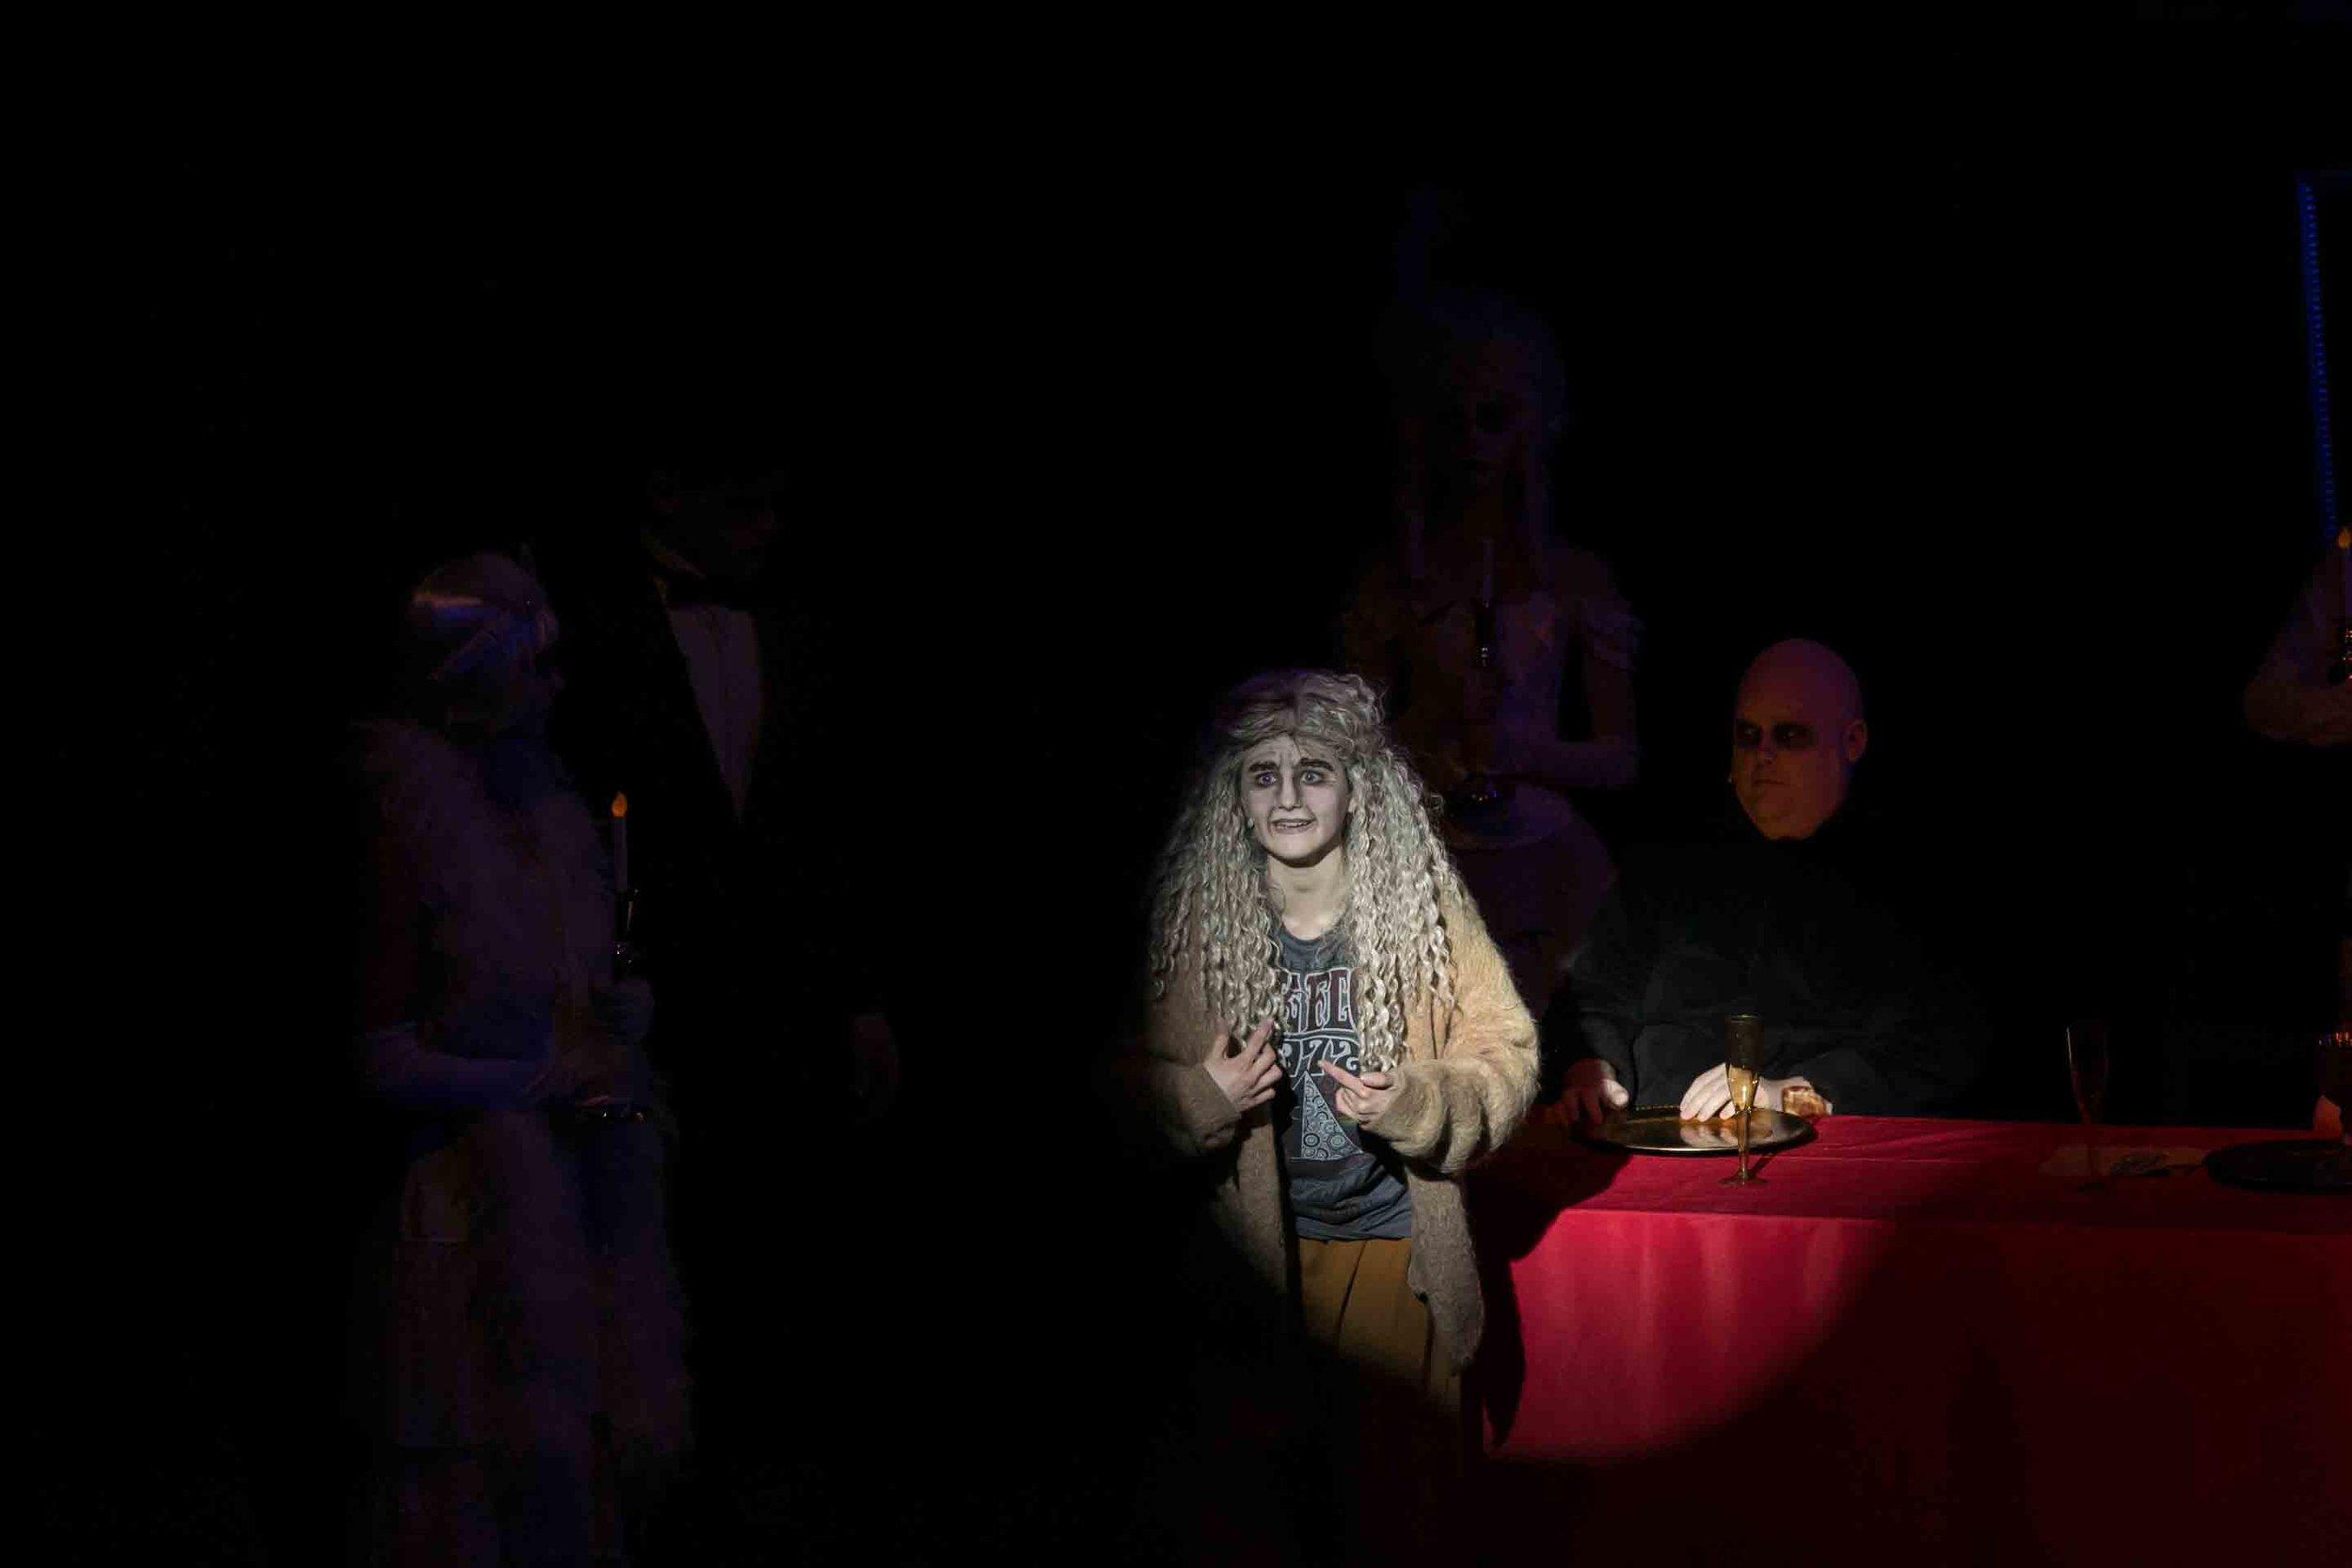 6-19-16 Addams Family Creepy Cast 0190.jpg